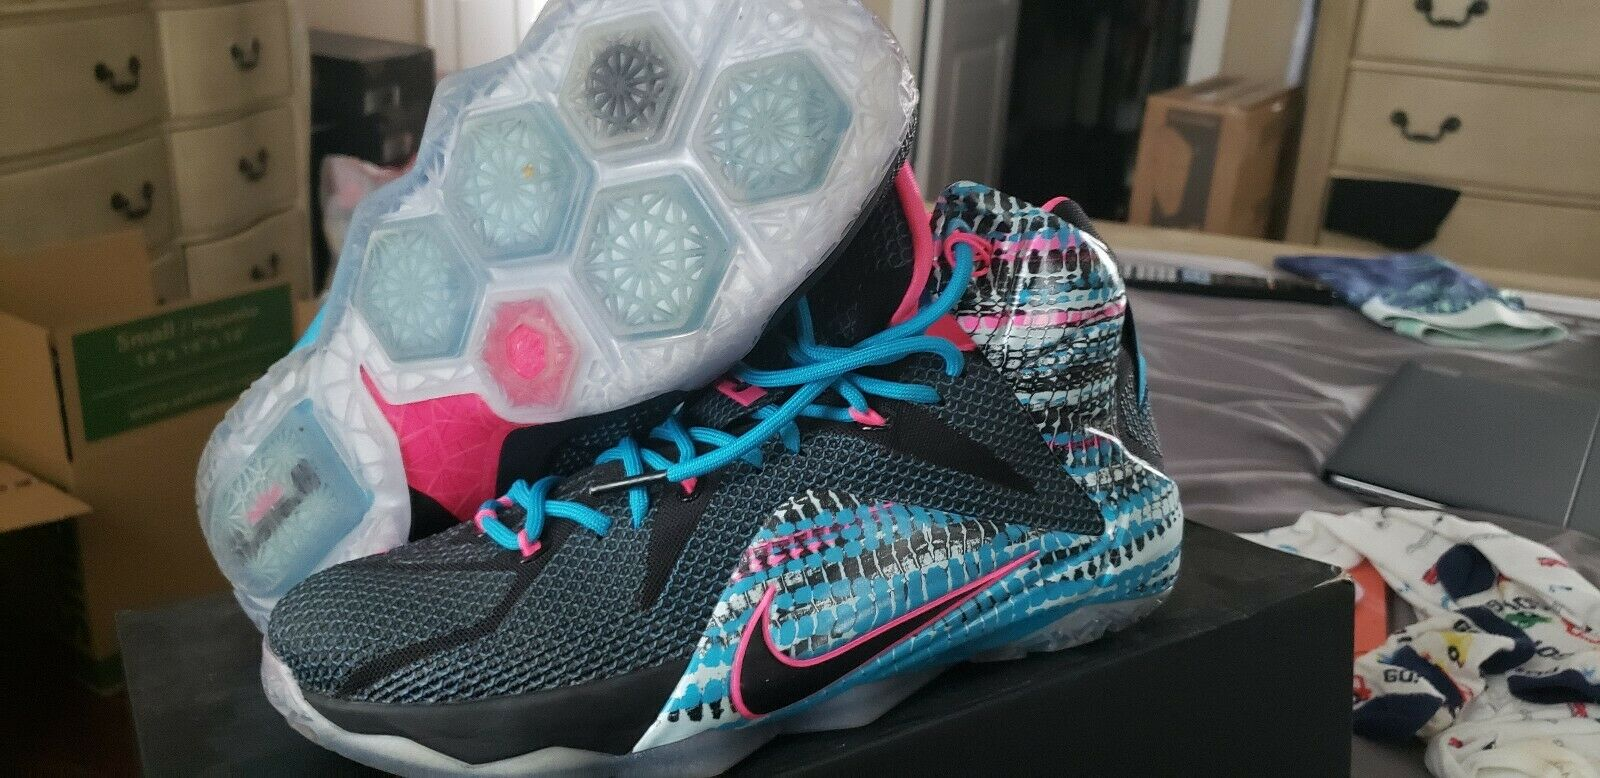 6ec42d30cd7e40 Nike Lebron Lebron Lebron 12 XII 23 Chromosomes Black Pink blueee Lagoon   684593-006